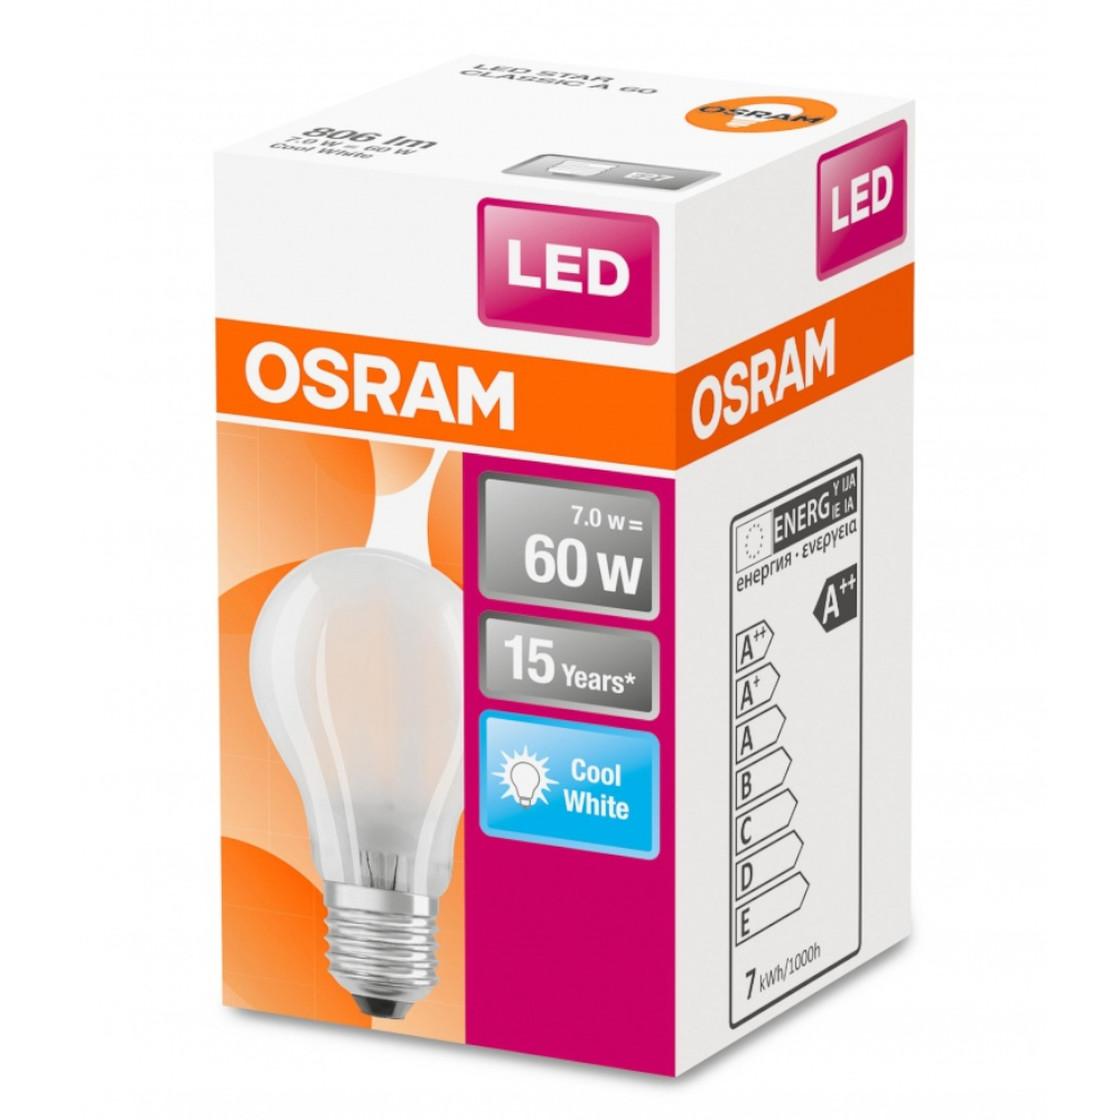 OSRAM LED STAR CLASSIC A 60 E27 7 W wie 60 W kaltweiß nicht dimmbar